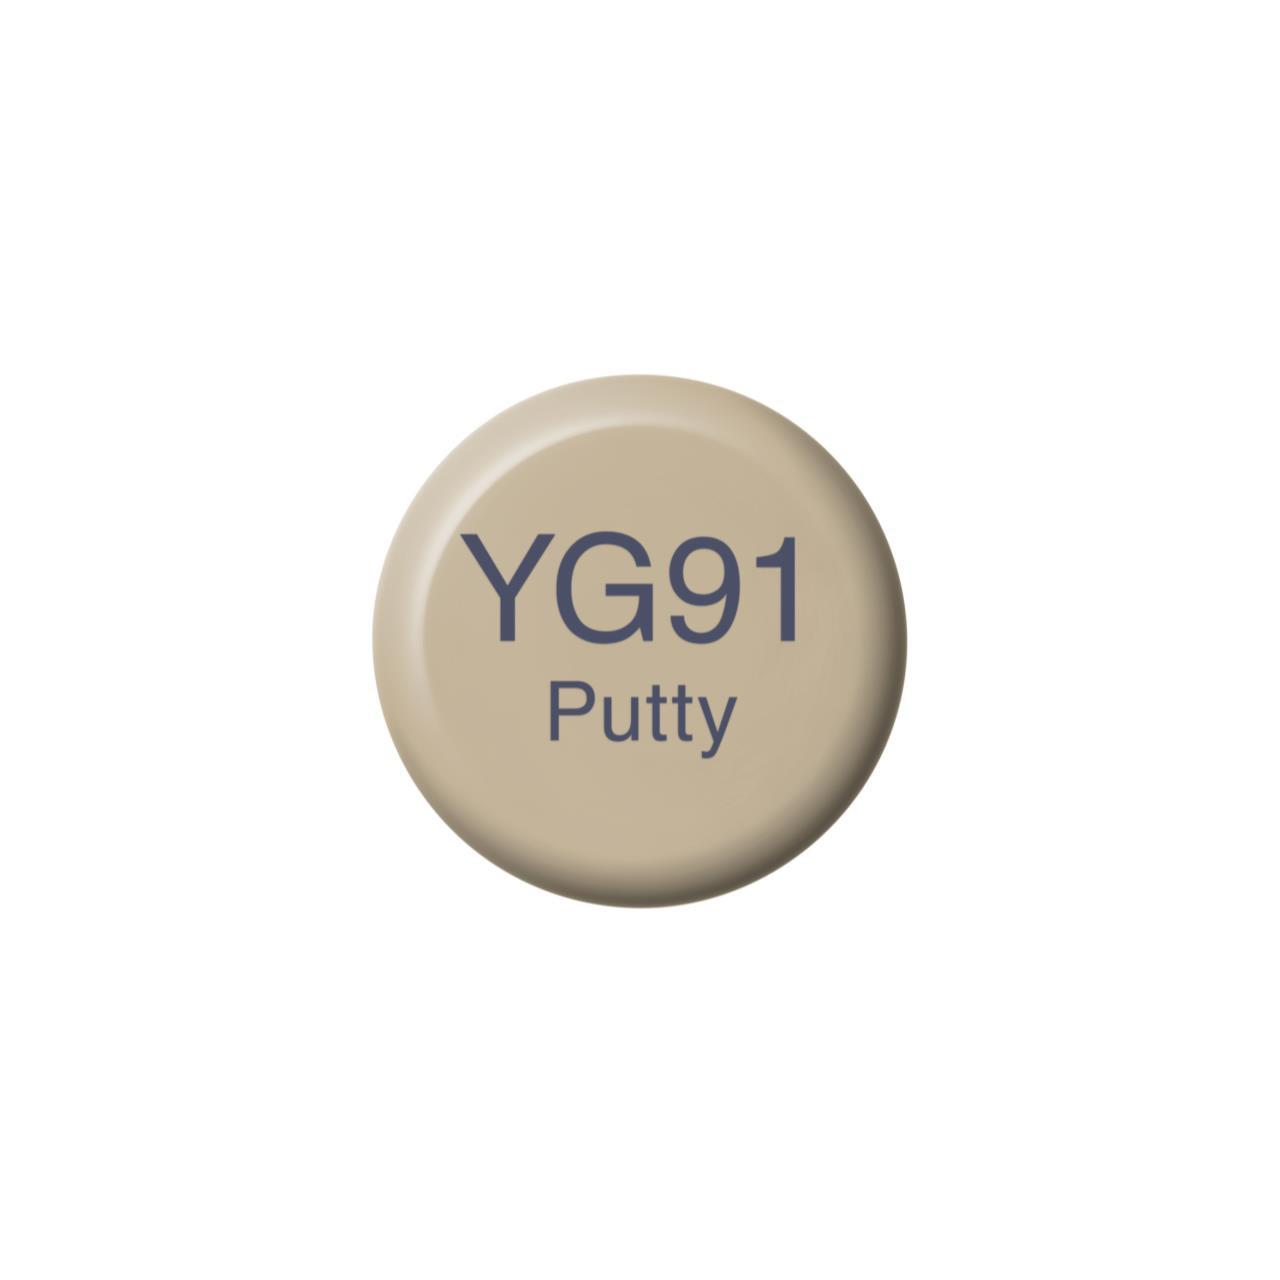 YG91 Putty, Copic Ink - 4511338058527